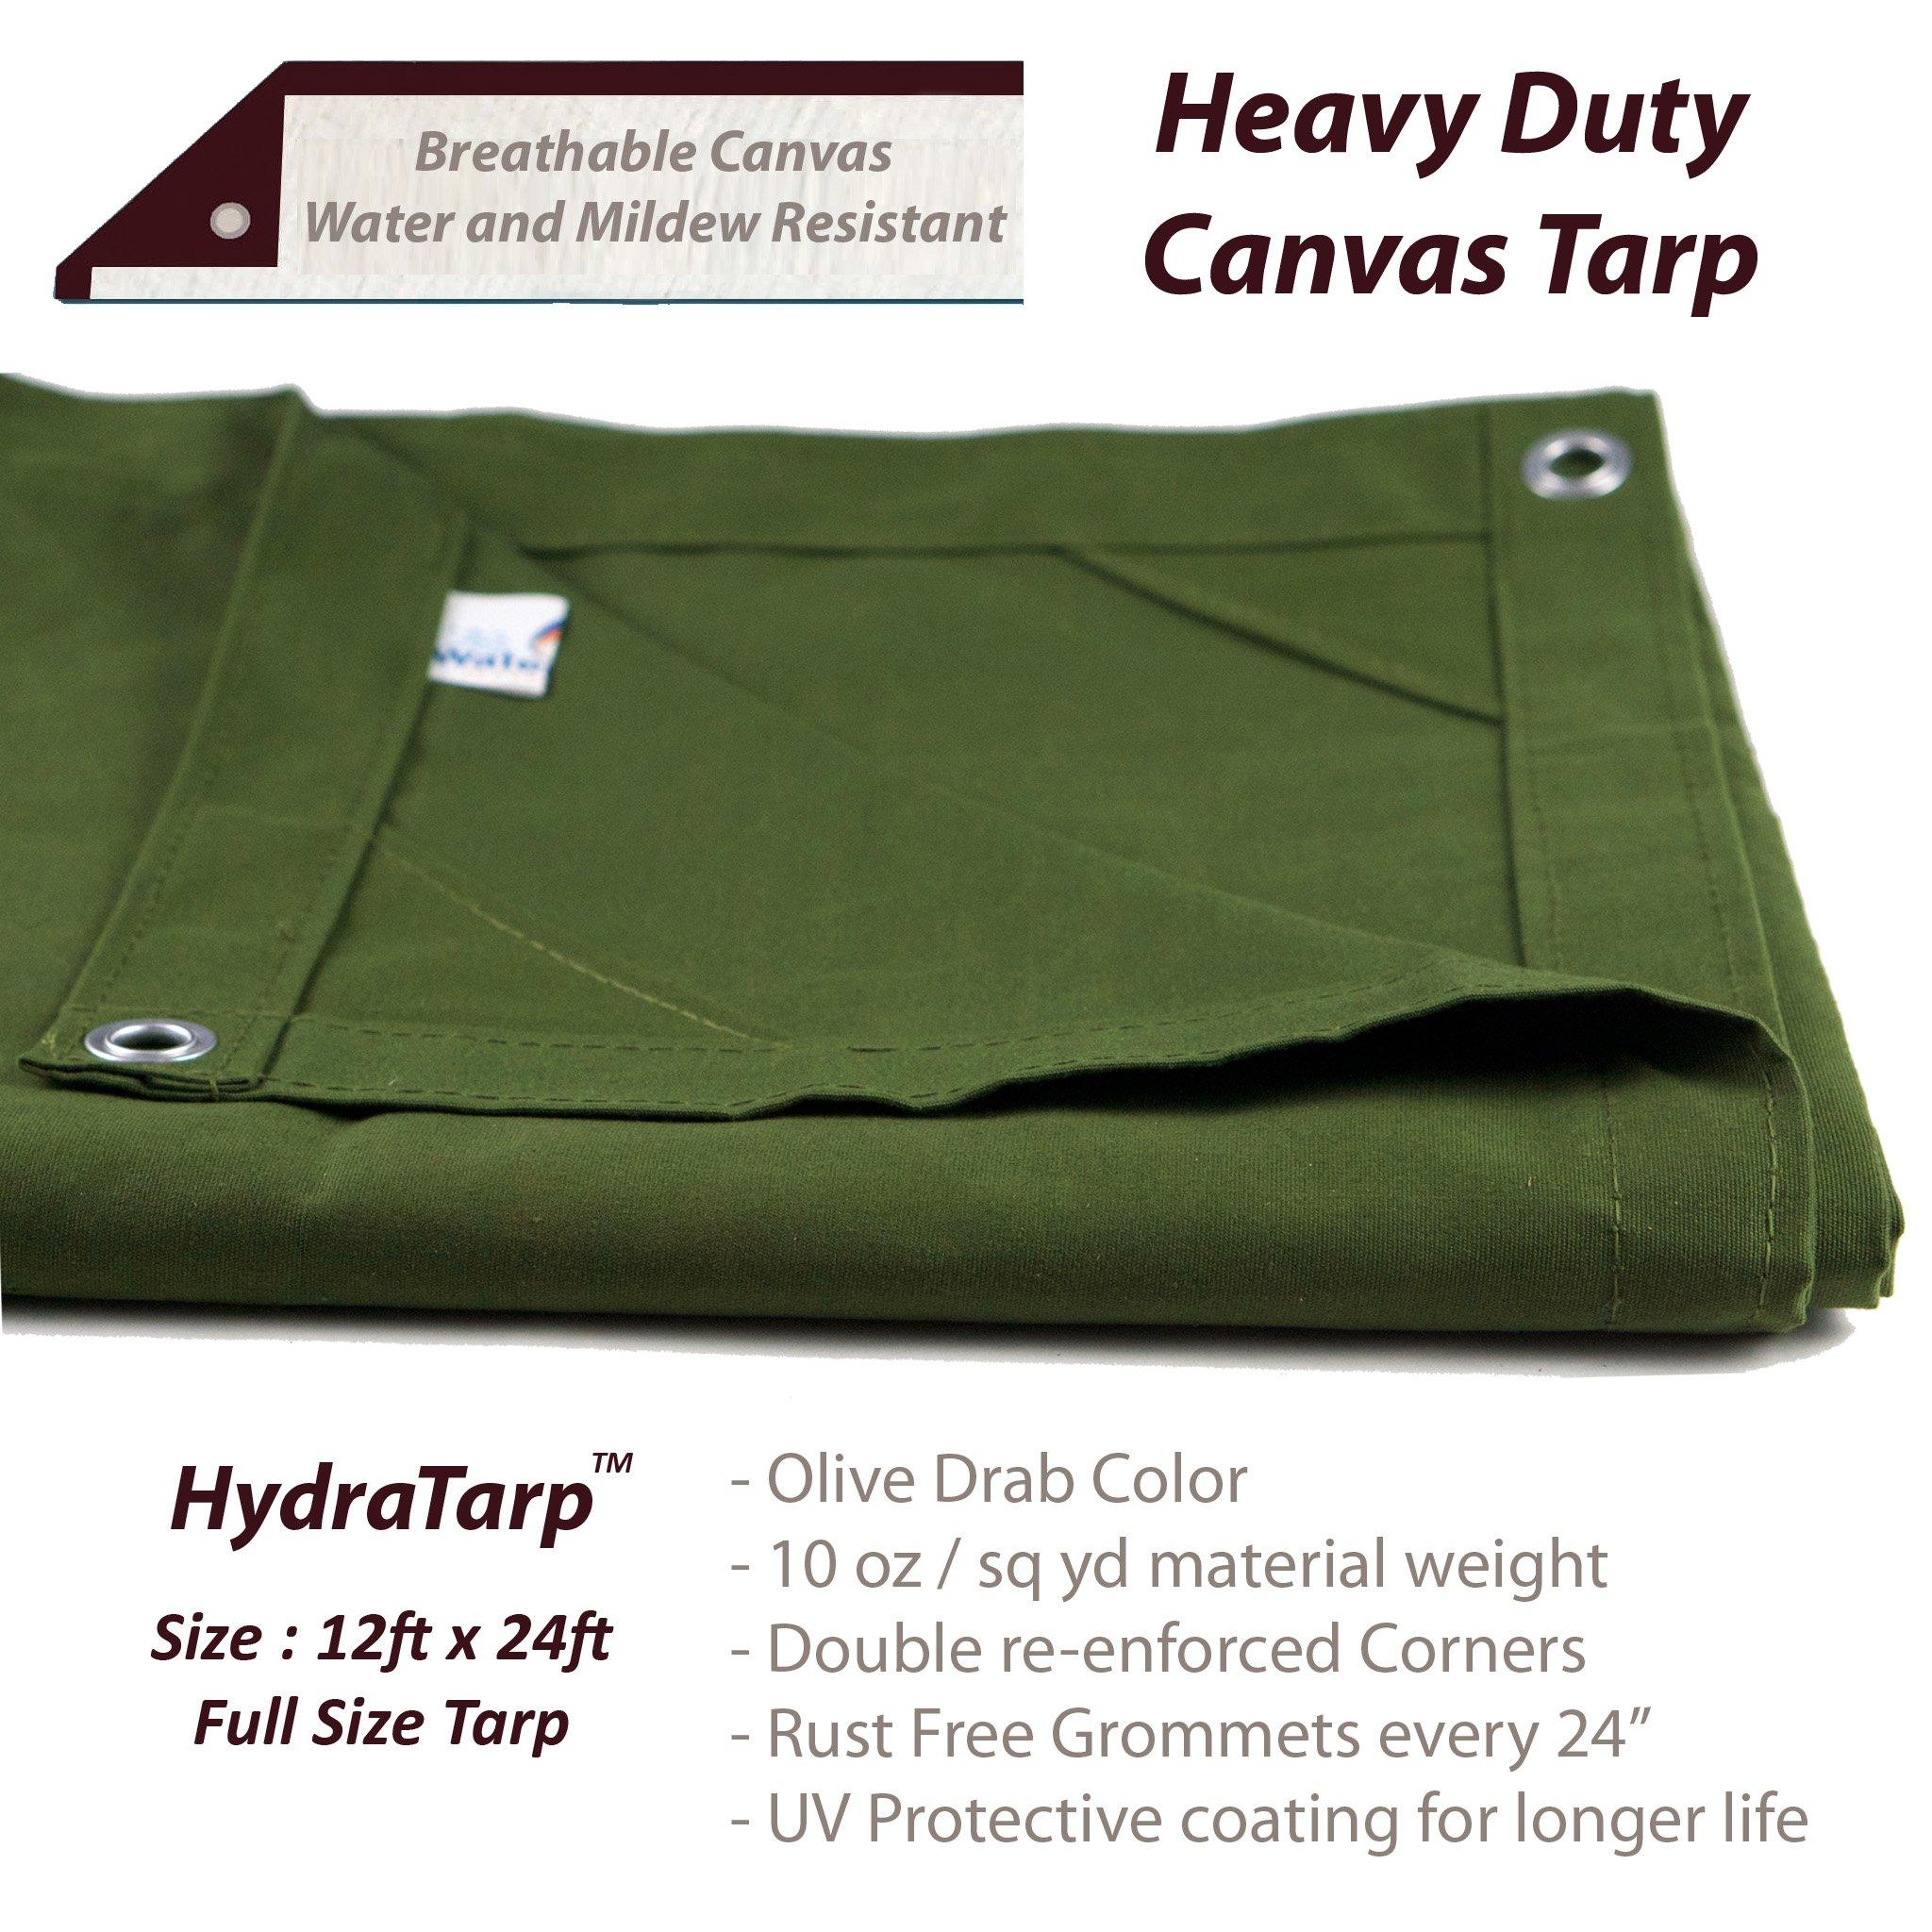 HydraTarp Canvas 12 Ft. X 24 Ft. Olive Drab Tarp - 10oz weight